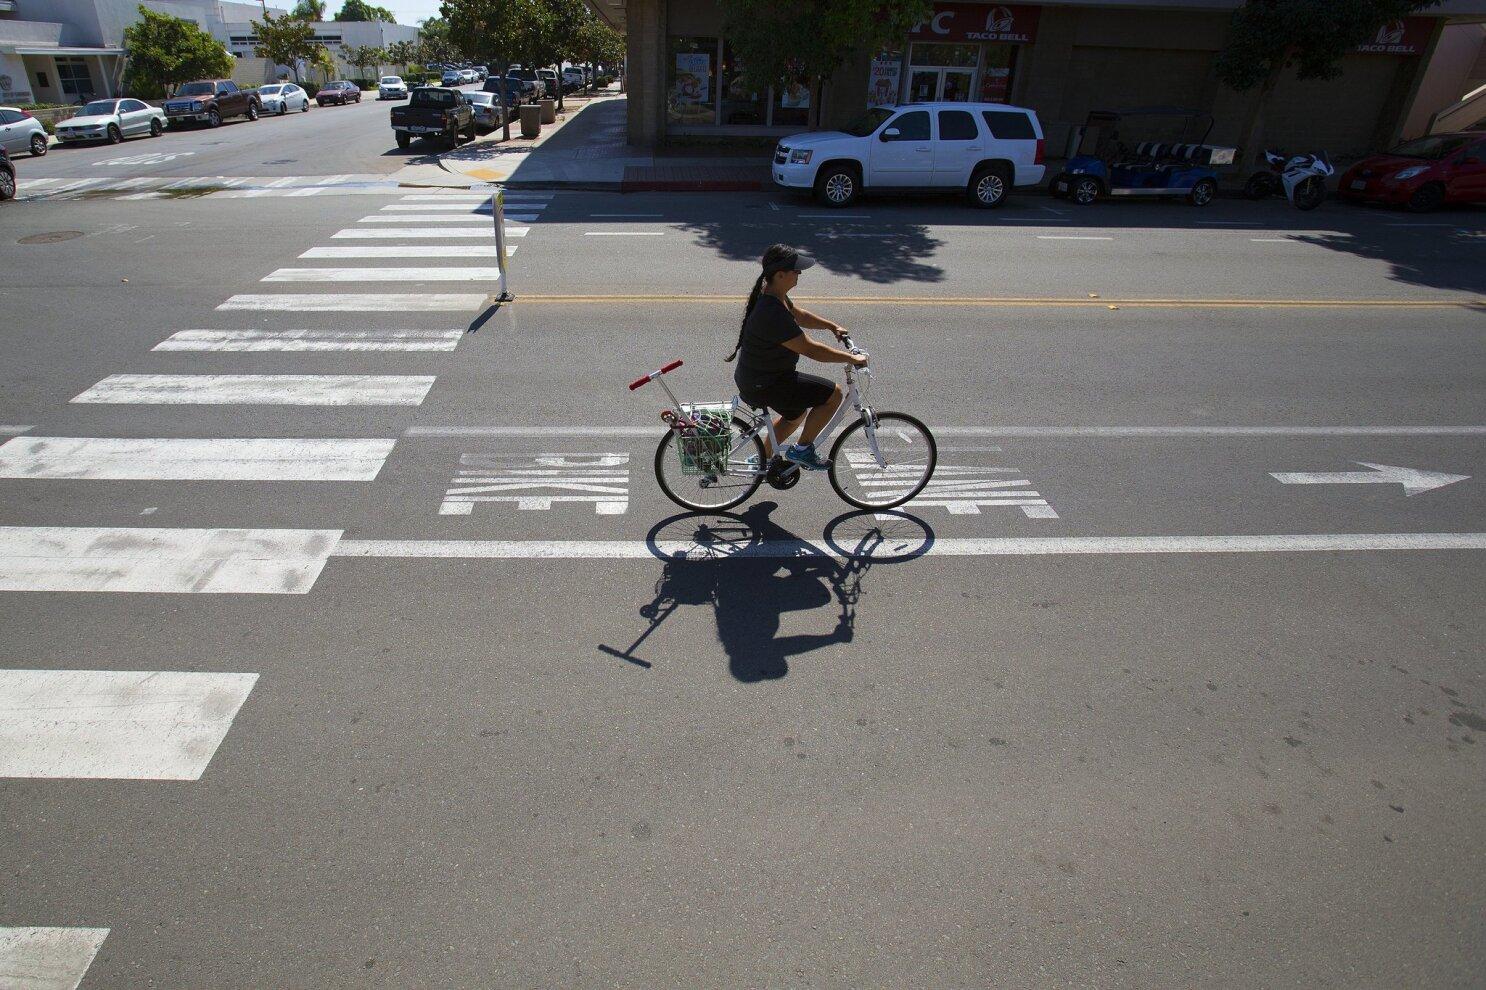 Bike lane backlash dividing Coronado - The San Diego Union-Tribune